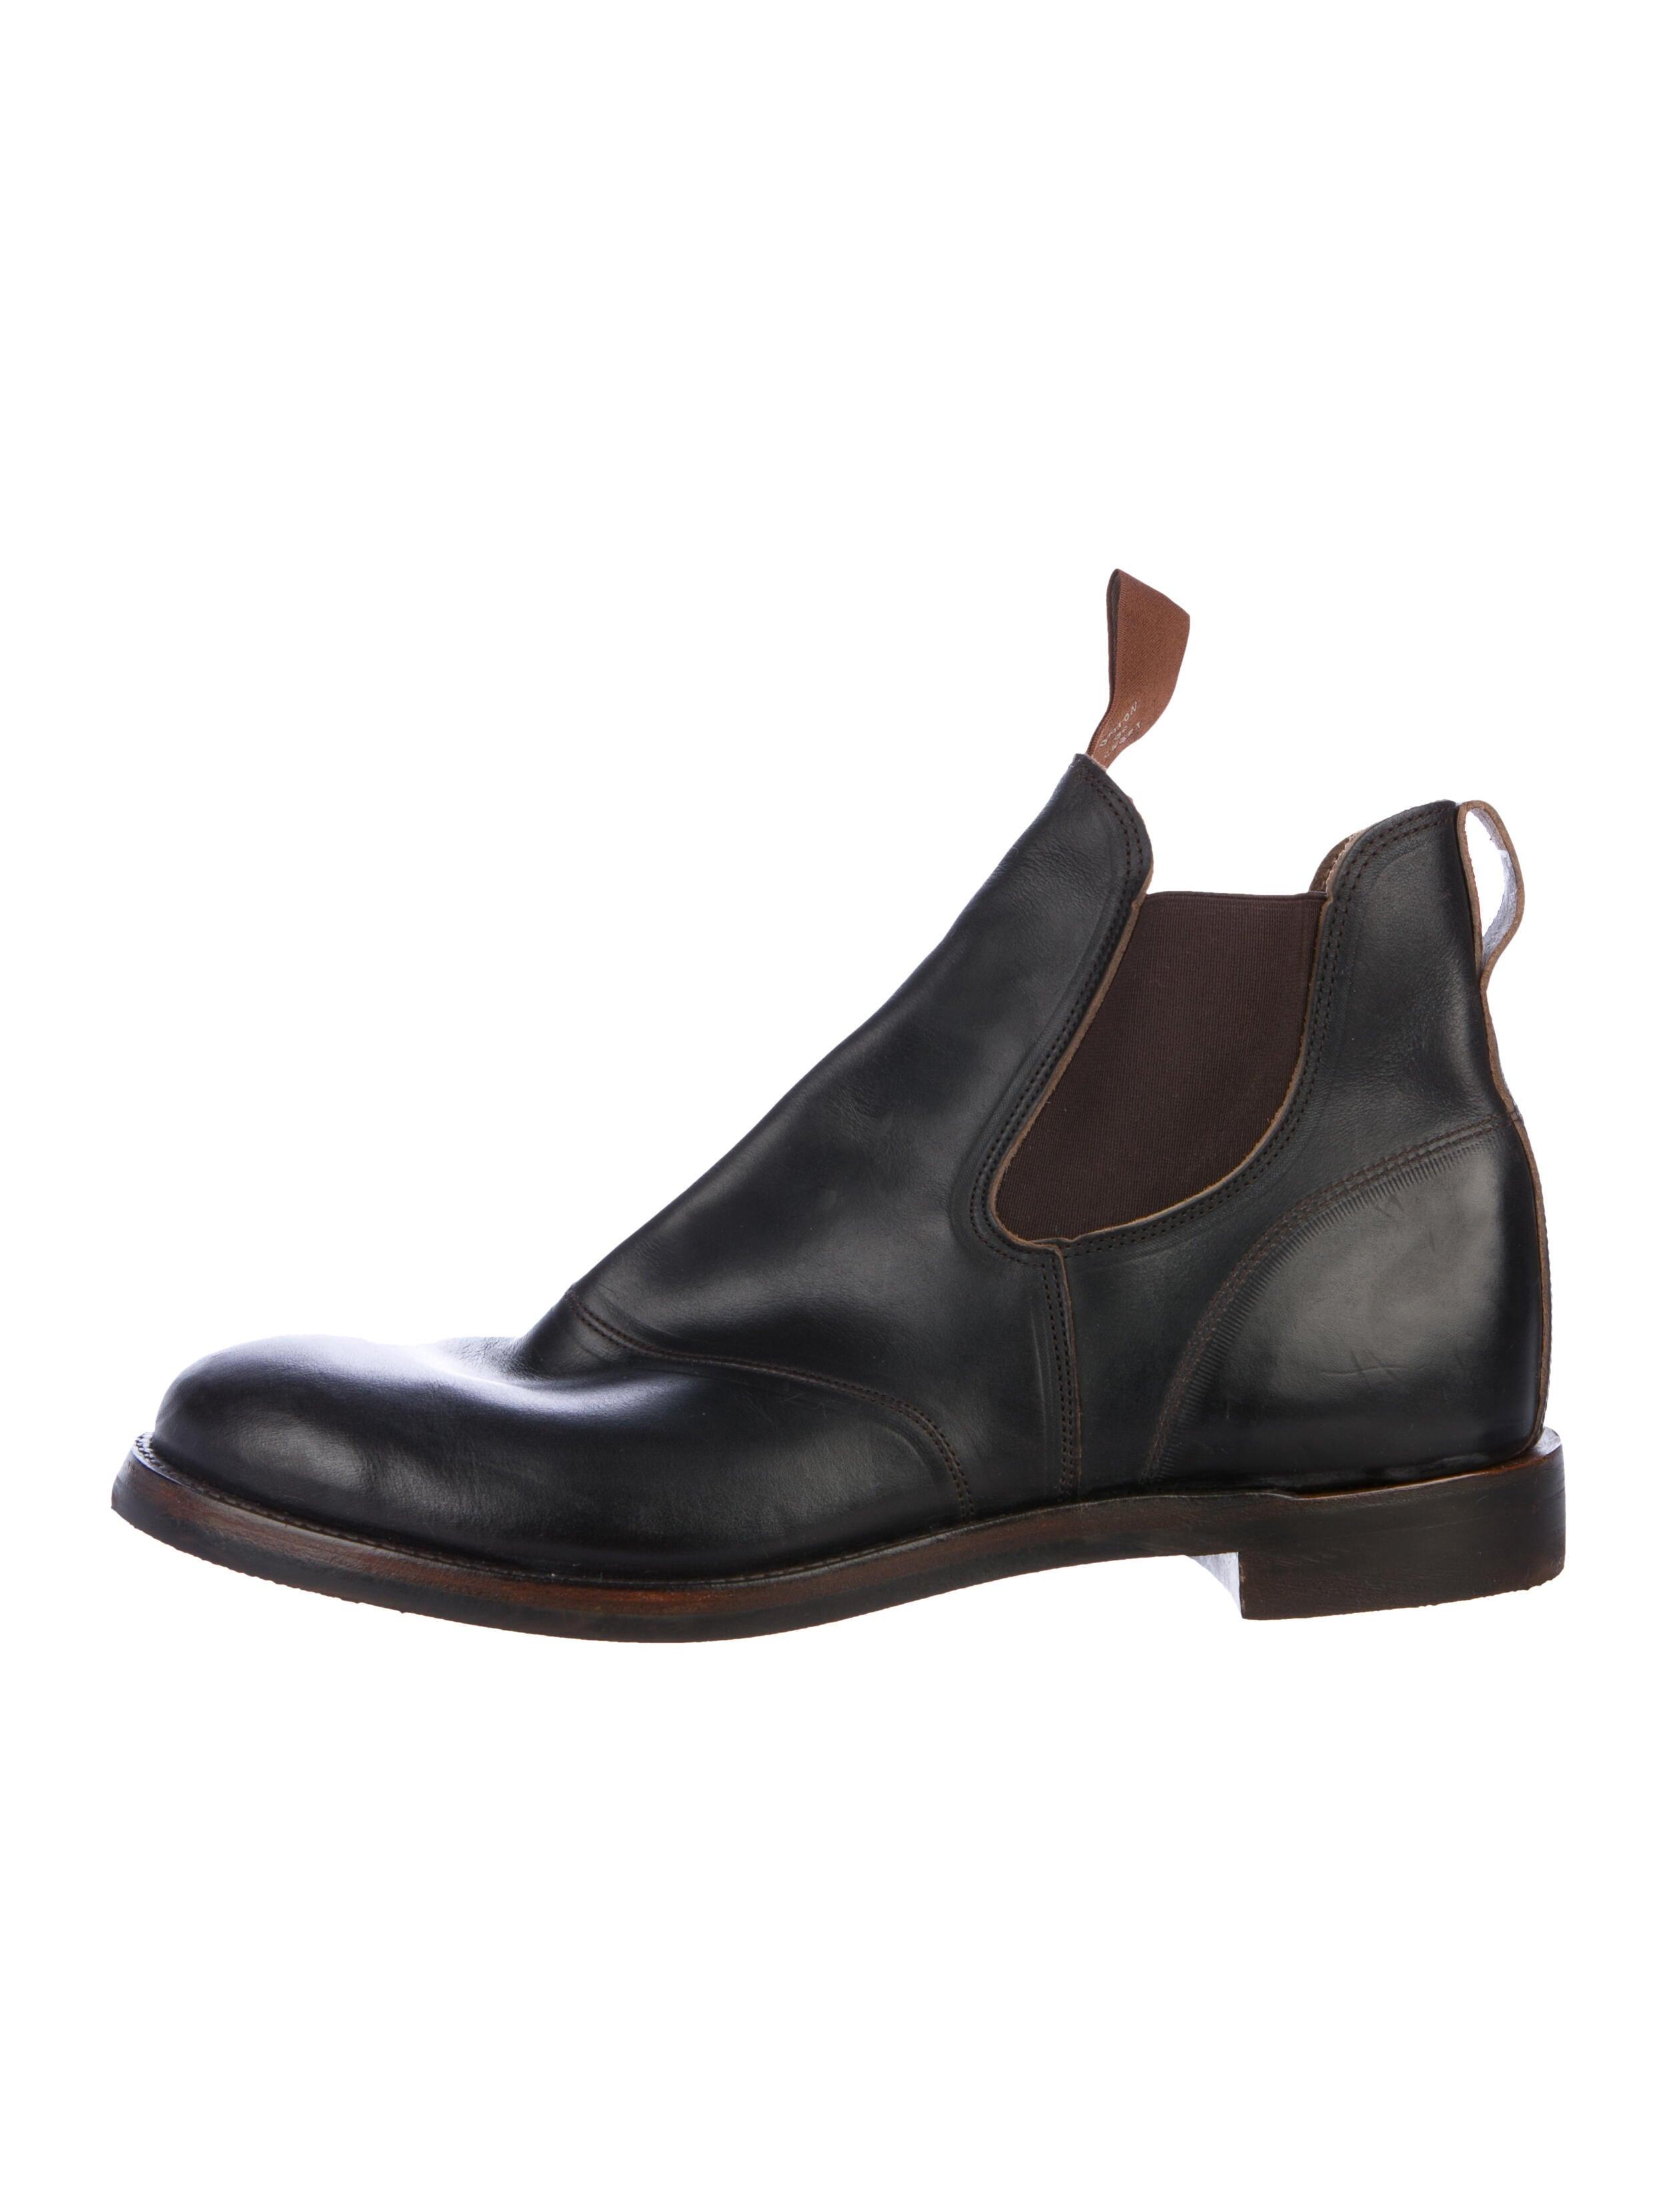 RRL \u0026 Co. Leather Chelsea Boots - Shoes